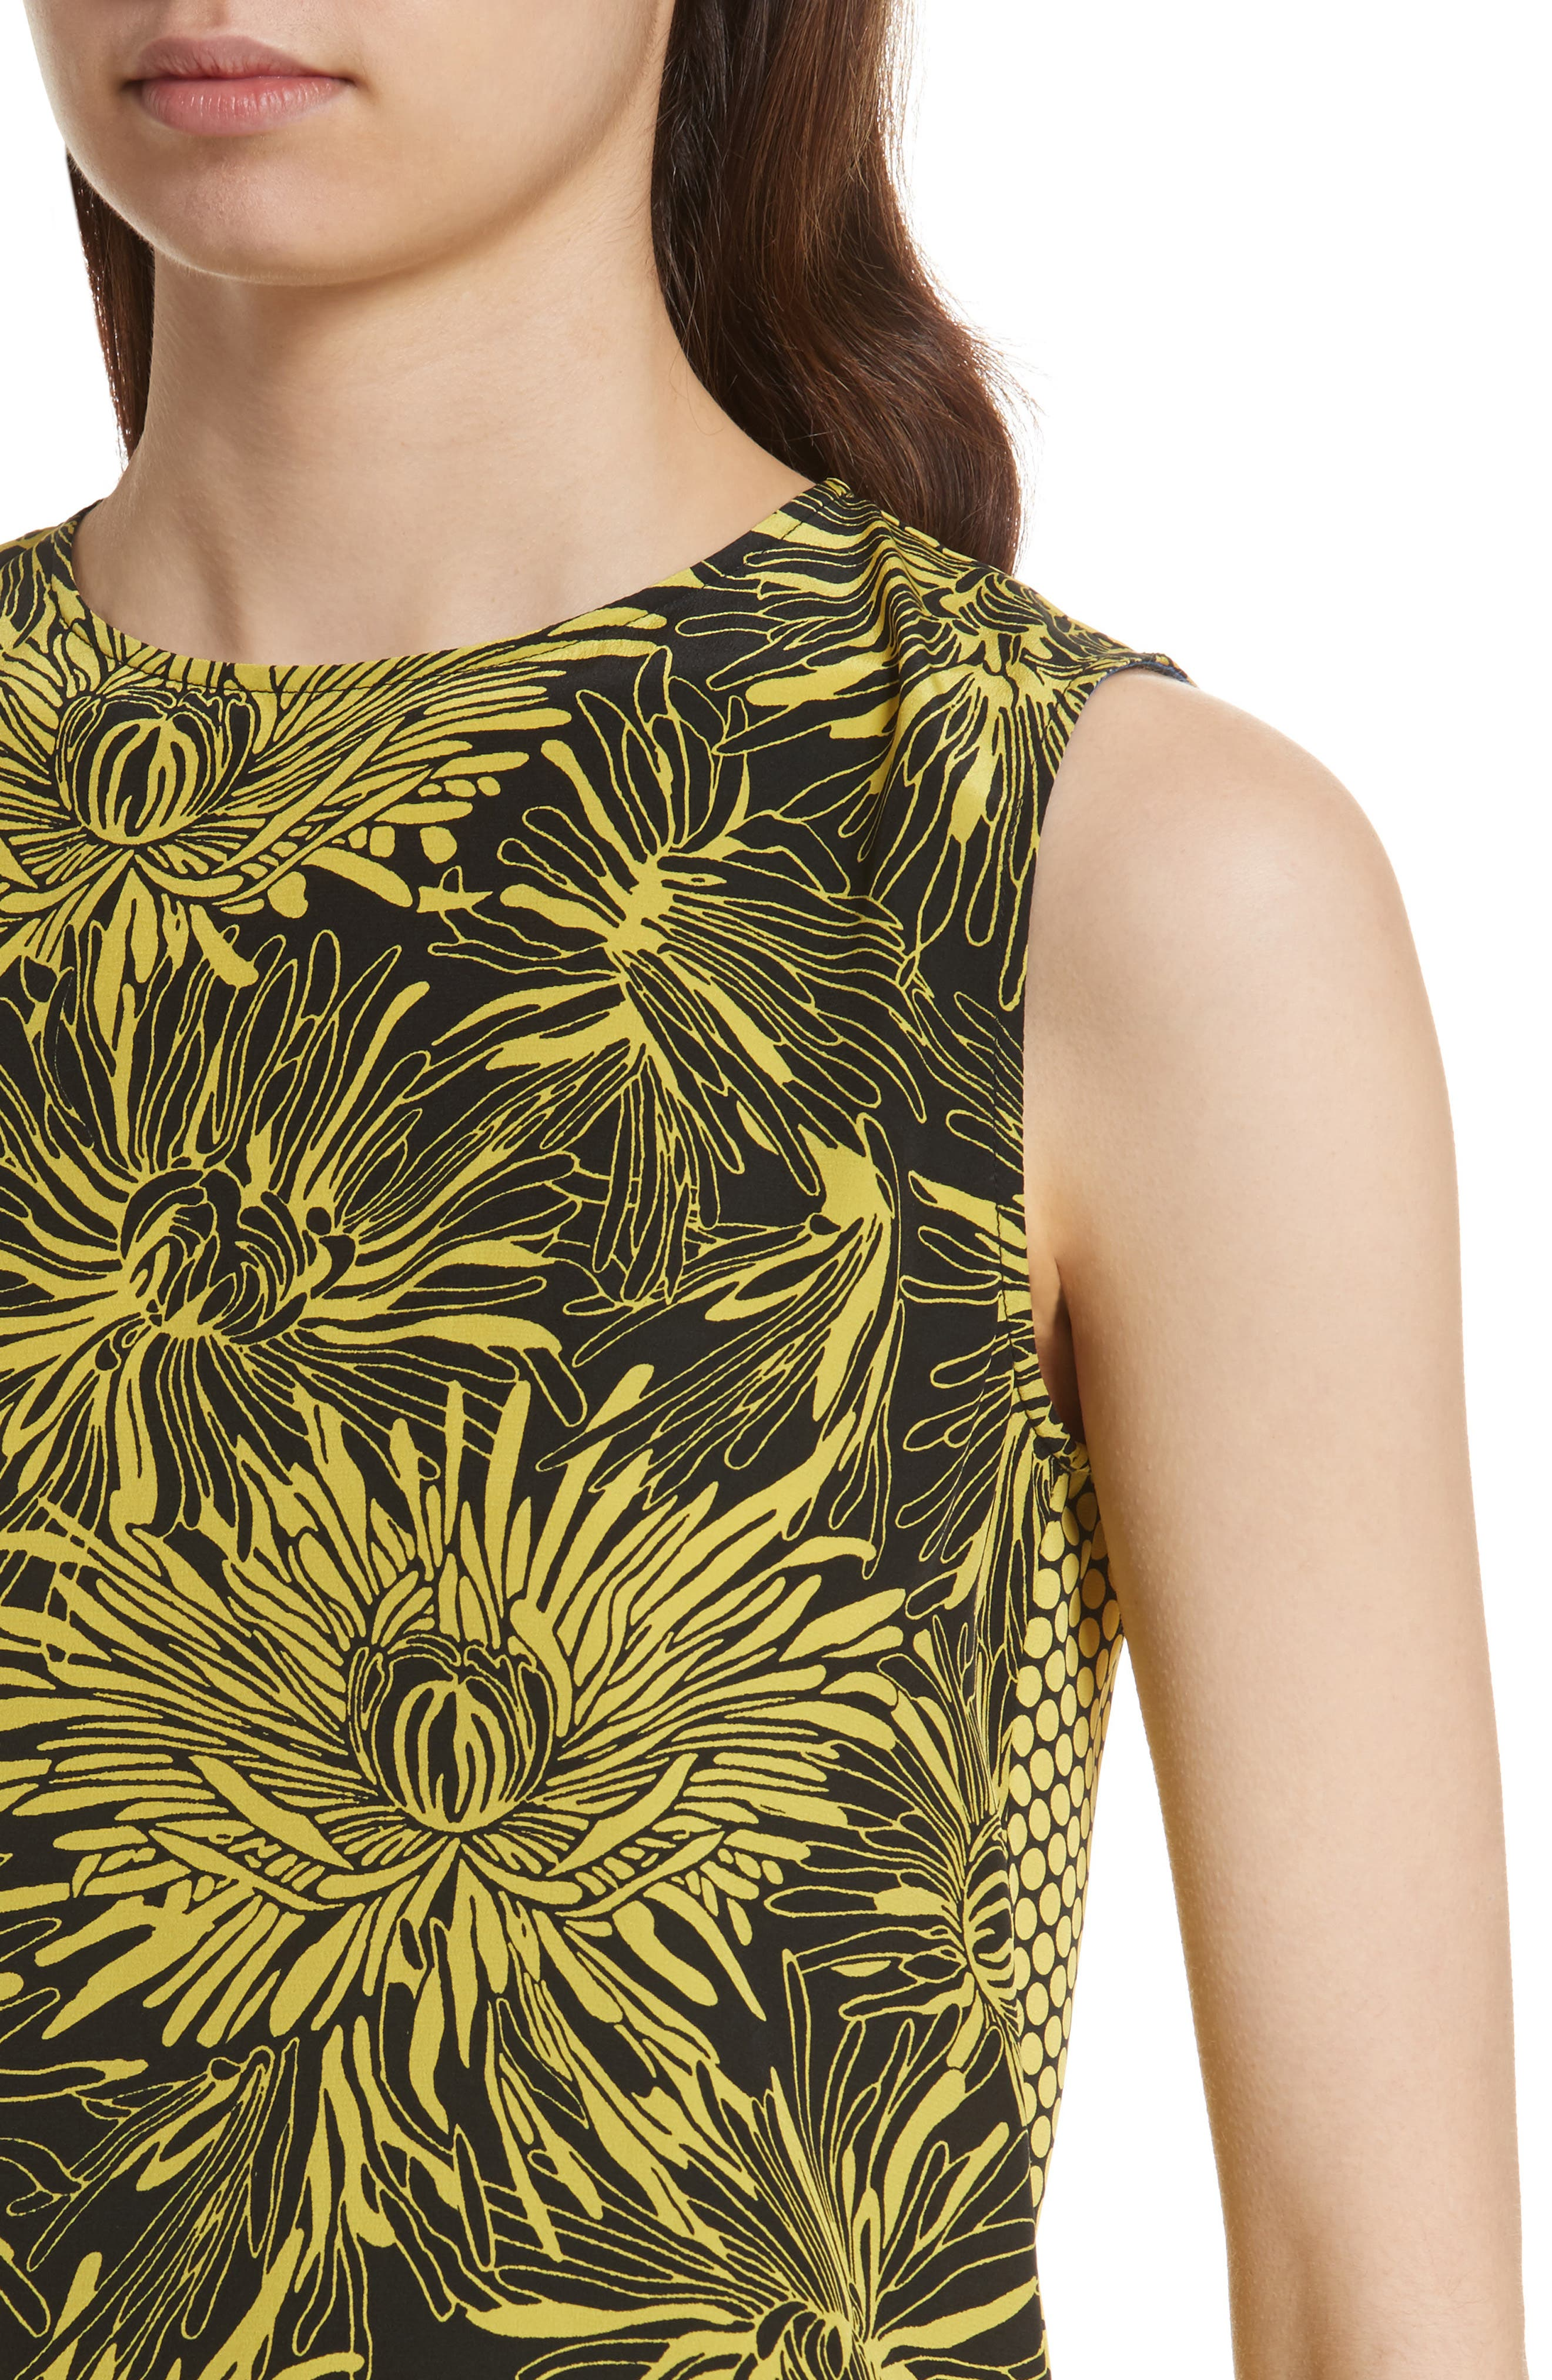 Diane von Furstenberg Floral Print Silk Shell,                             Alternate thumbnail 4, color,                             WORSLEY CITRON/ ROWE DOT